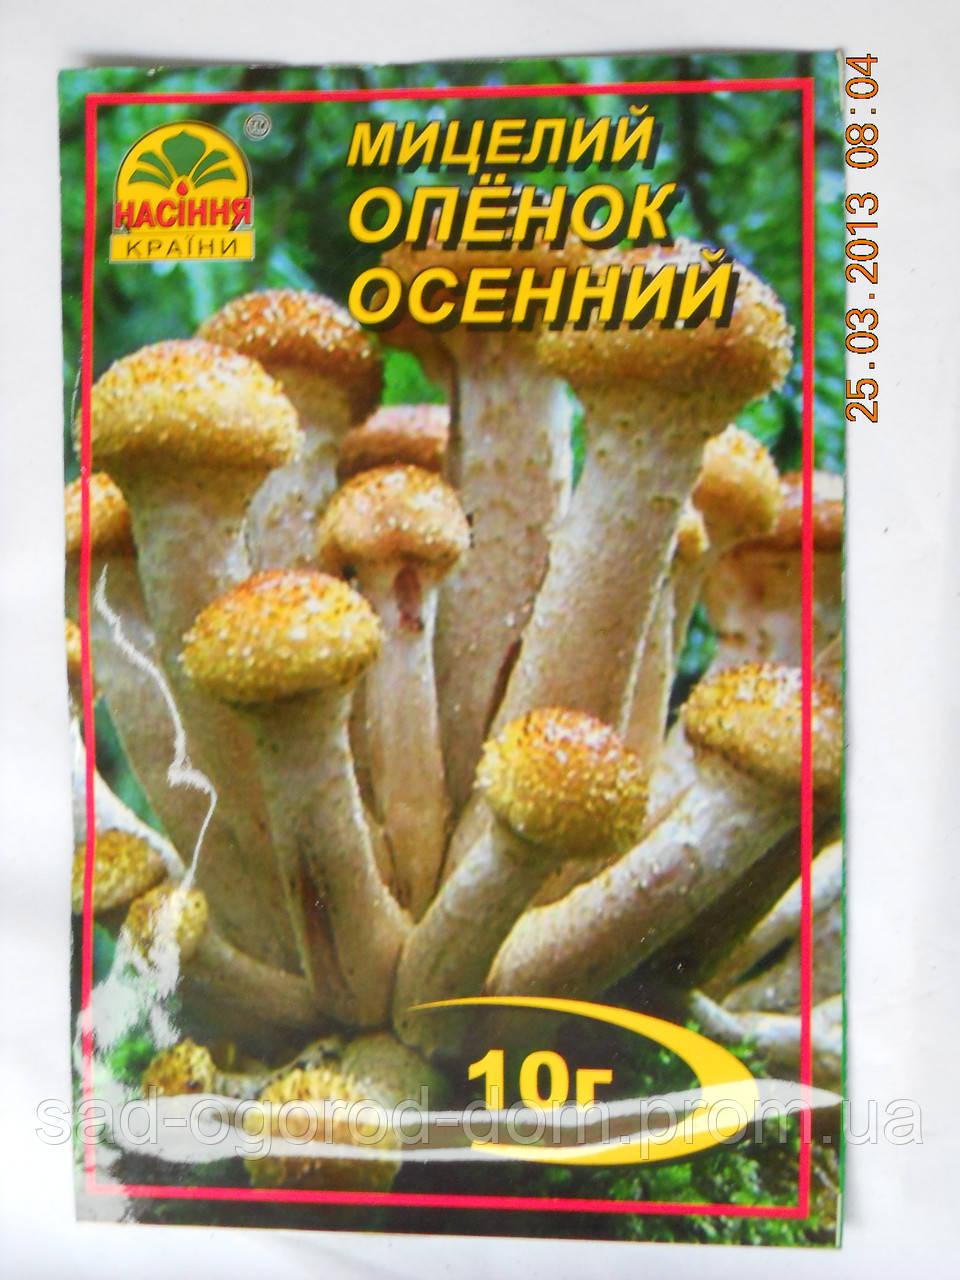 Мицелий Опенка осеннего